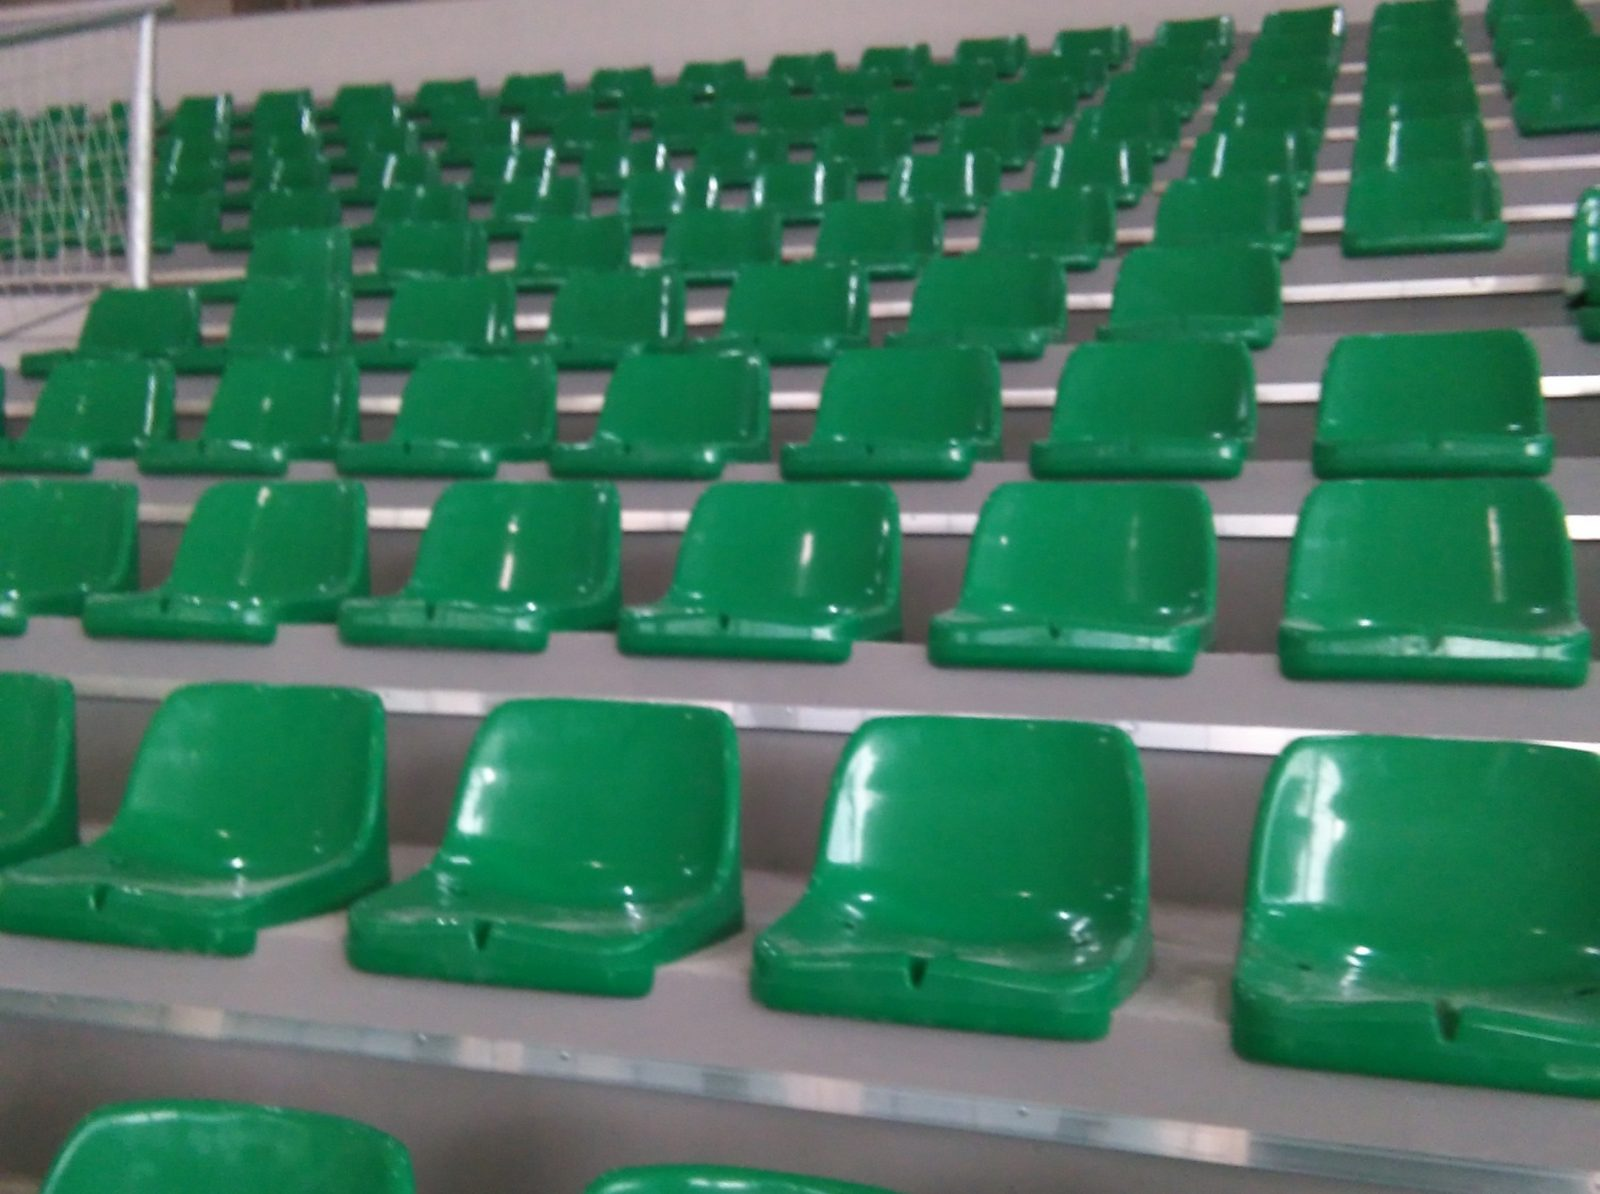 Jablanica Spor Salonu / Bosna Hersek